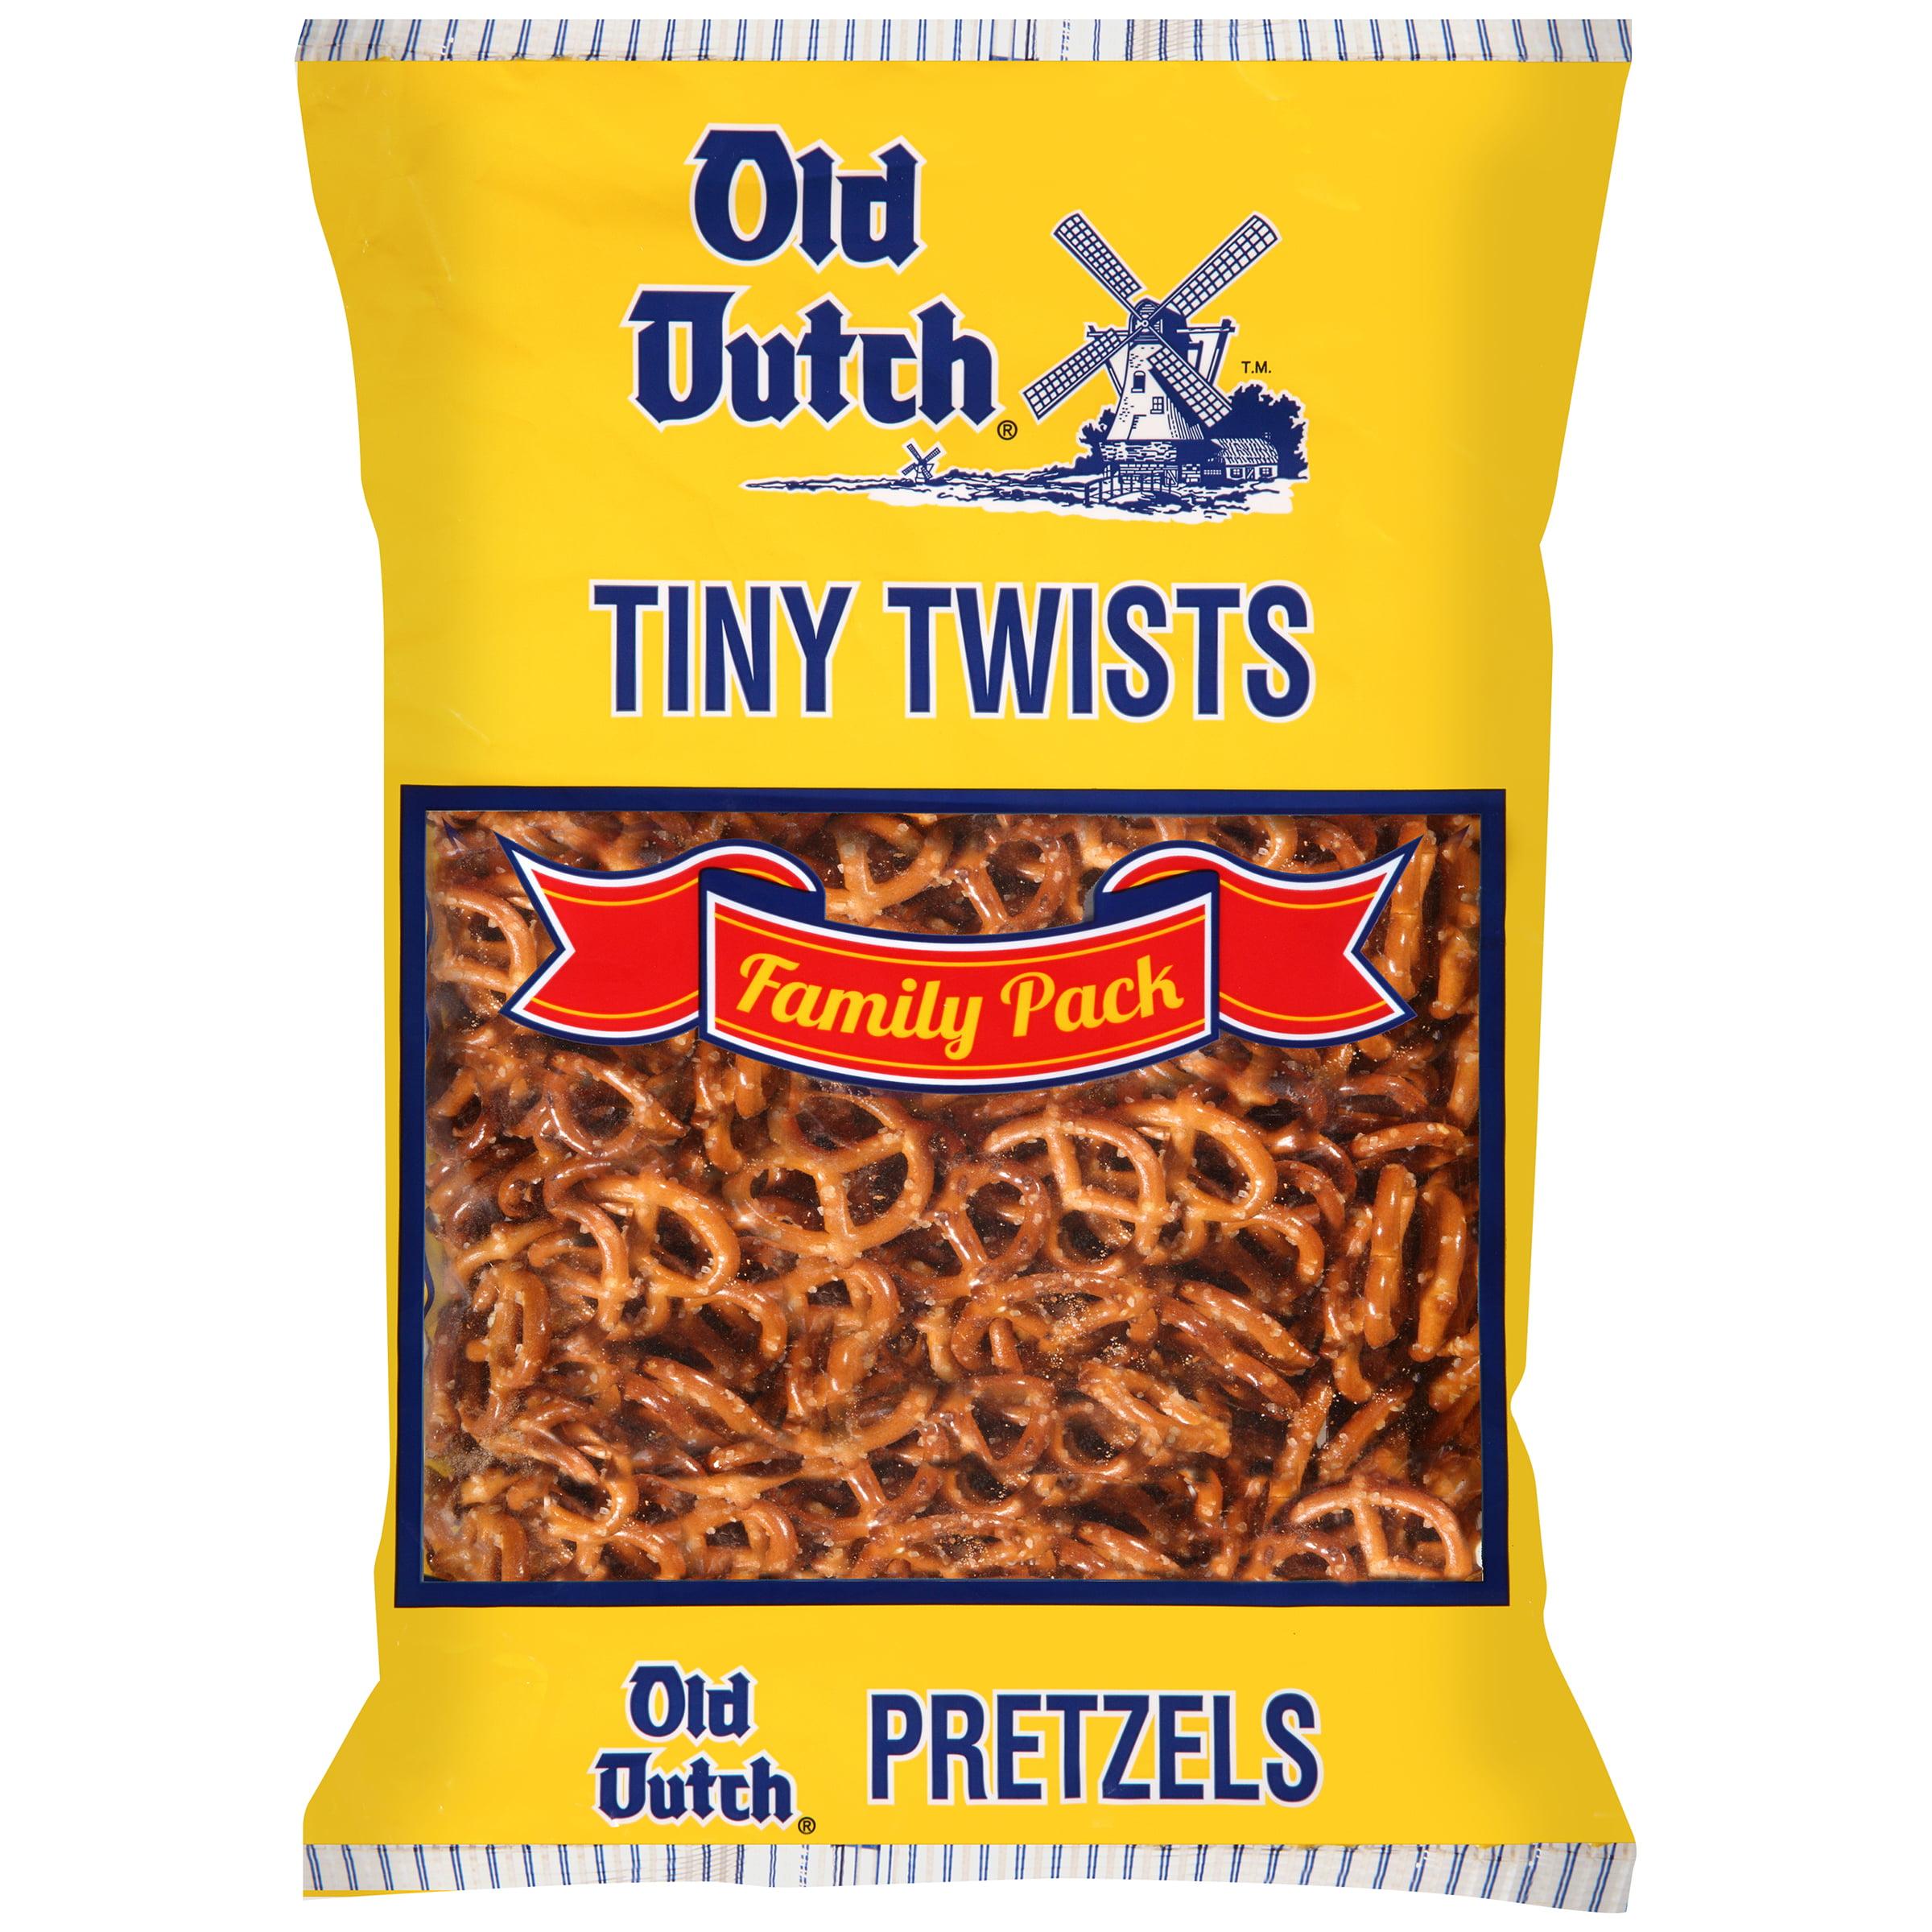 Old Dutch Tiny Twists Pretzels Family Pack, 26 Oz.